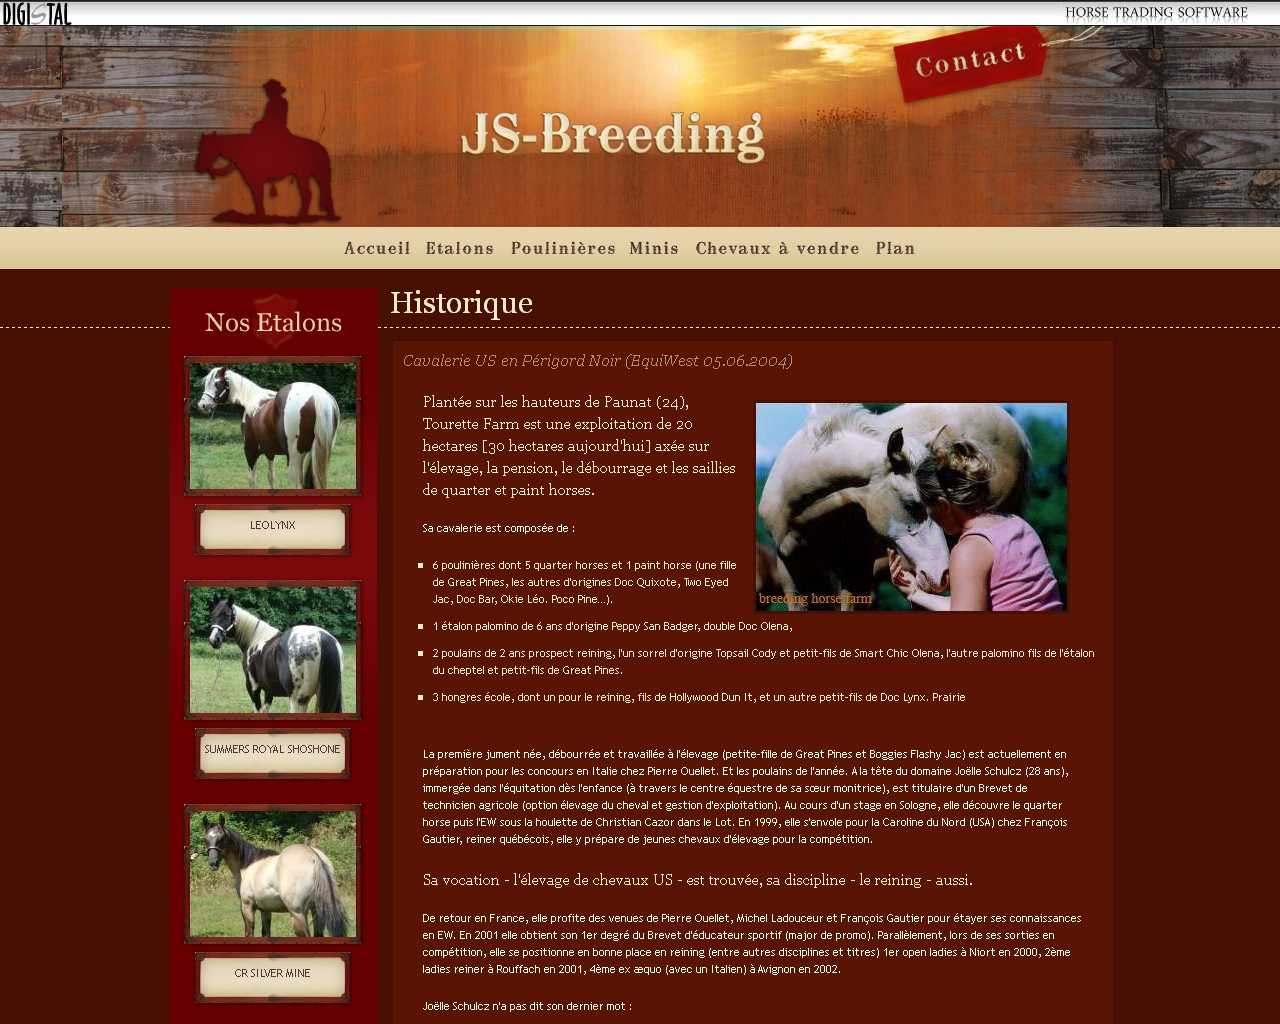 JS-Breeding